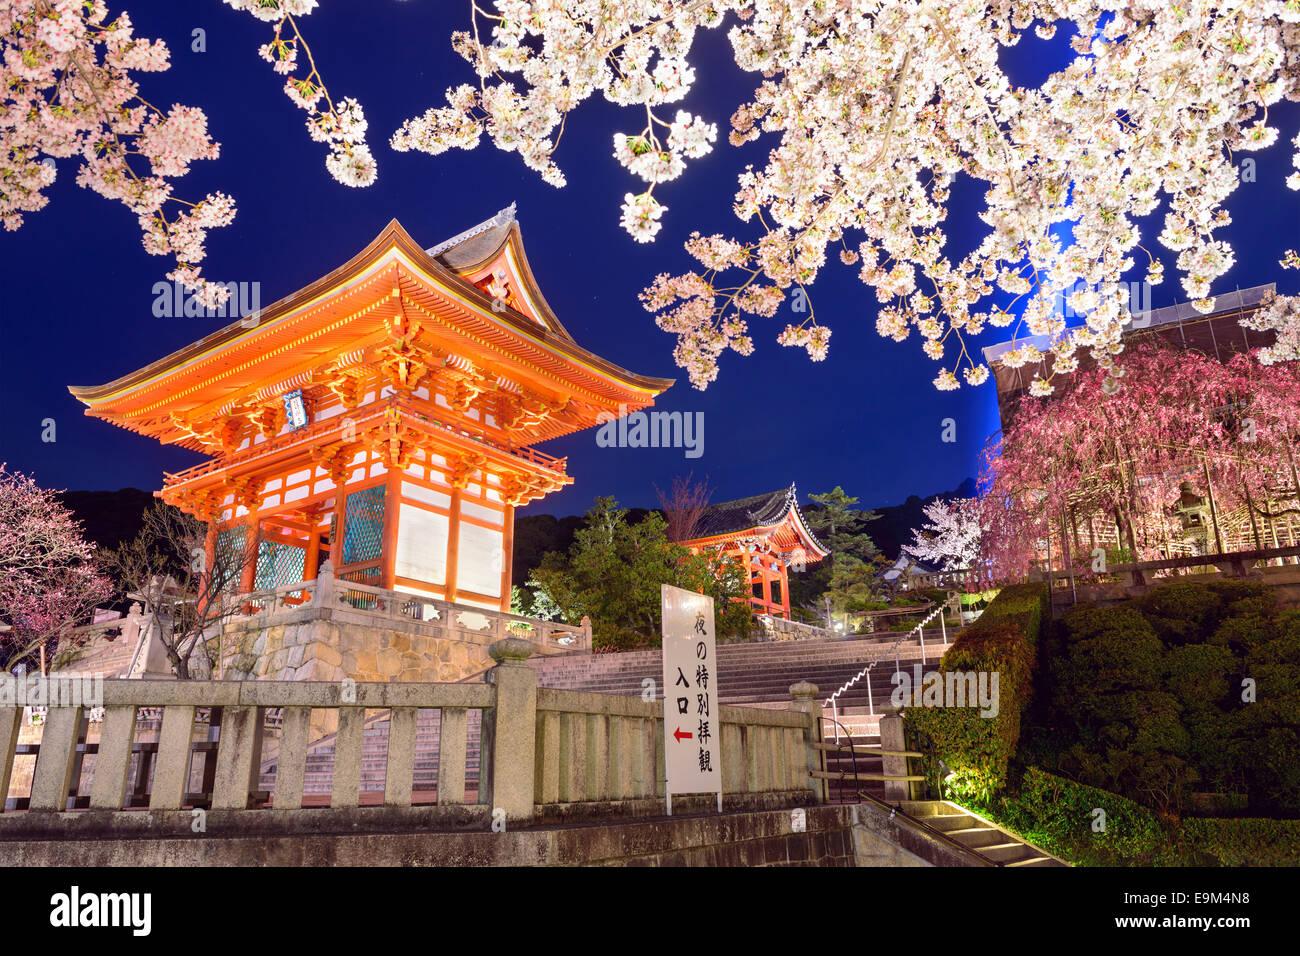 Kyoto, au Japon, au Temple Kiyomizu-dera au printemps. Photo Stock